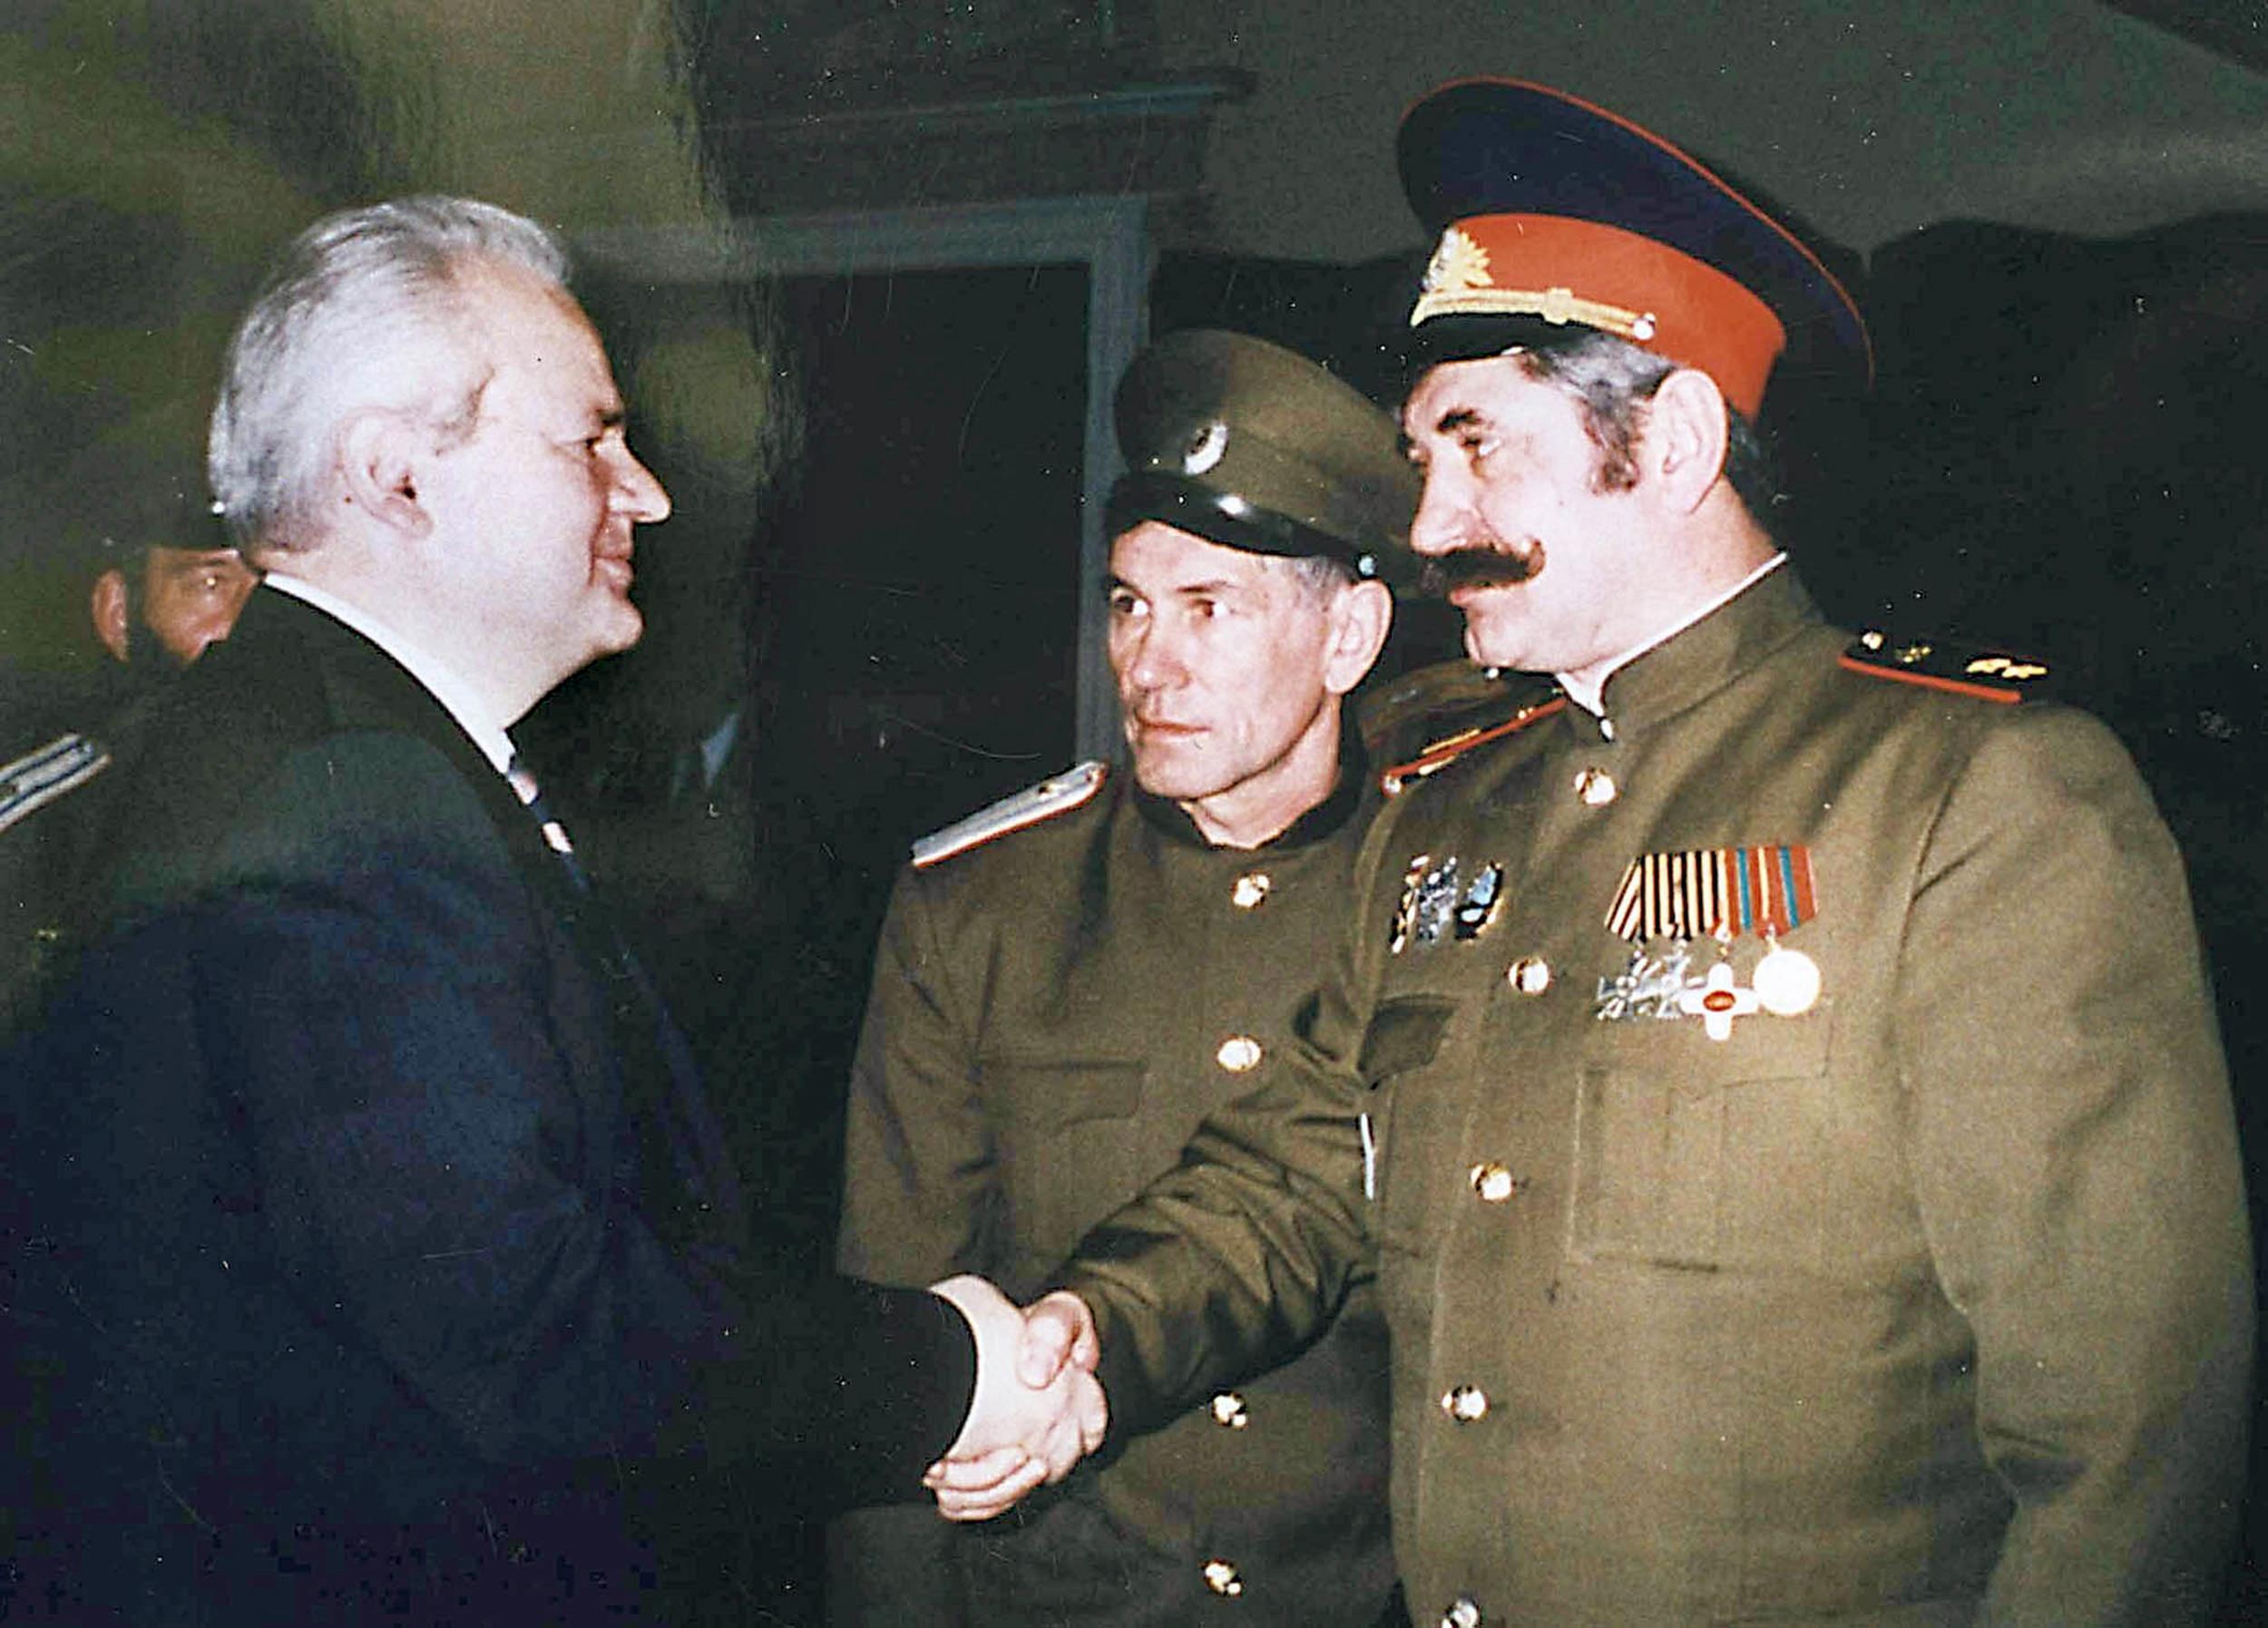 Image: Yugoslav President Slobodan Milosevic shakes hands with Cossack Ataman Nikolai Kozitsyn